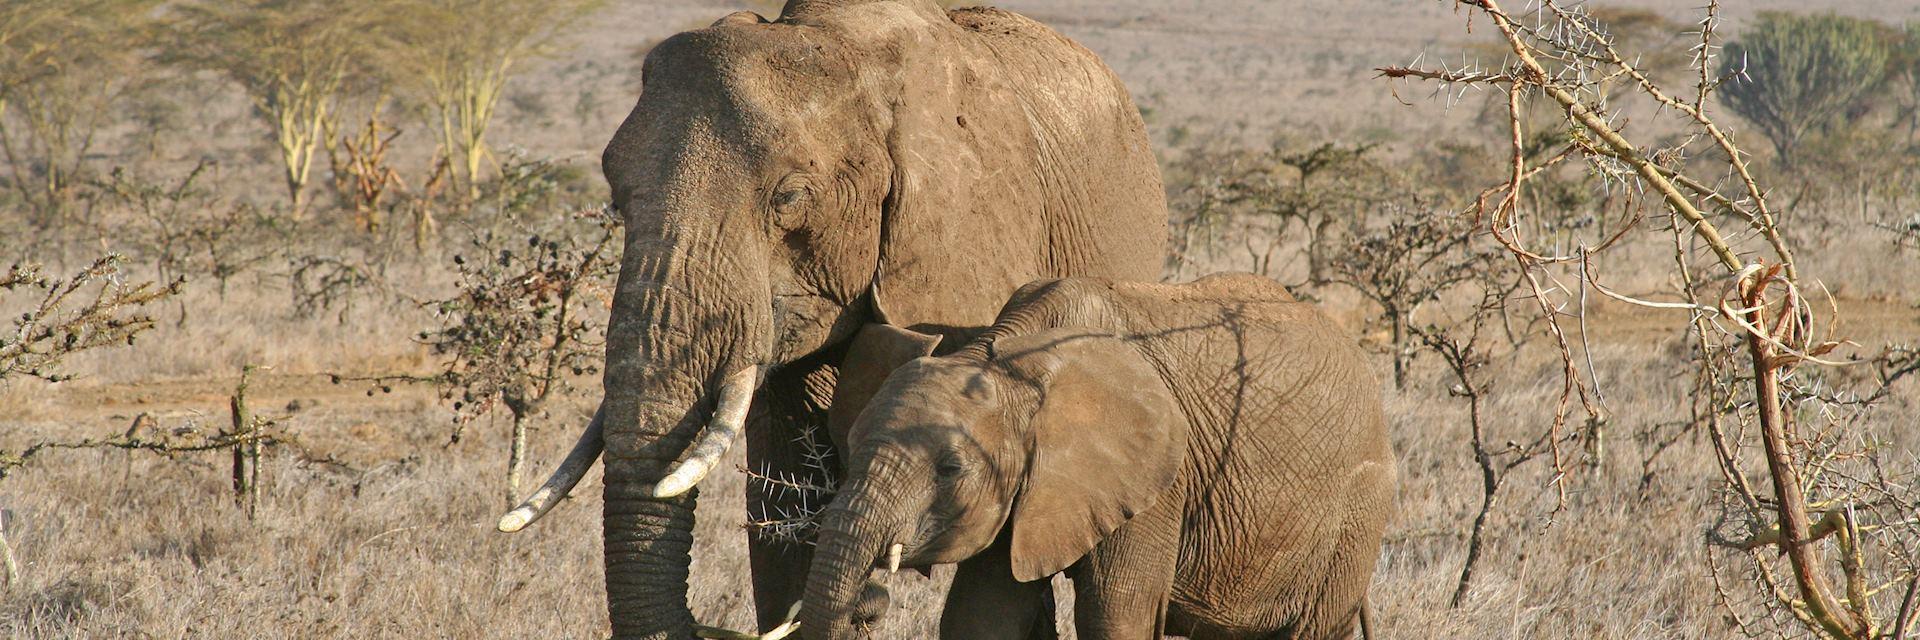 Elephant in Borana Conservancy